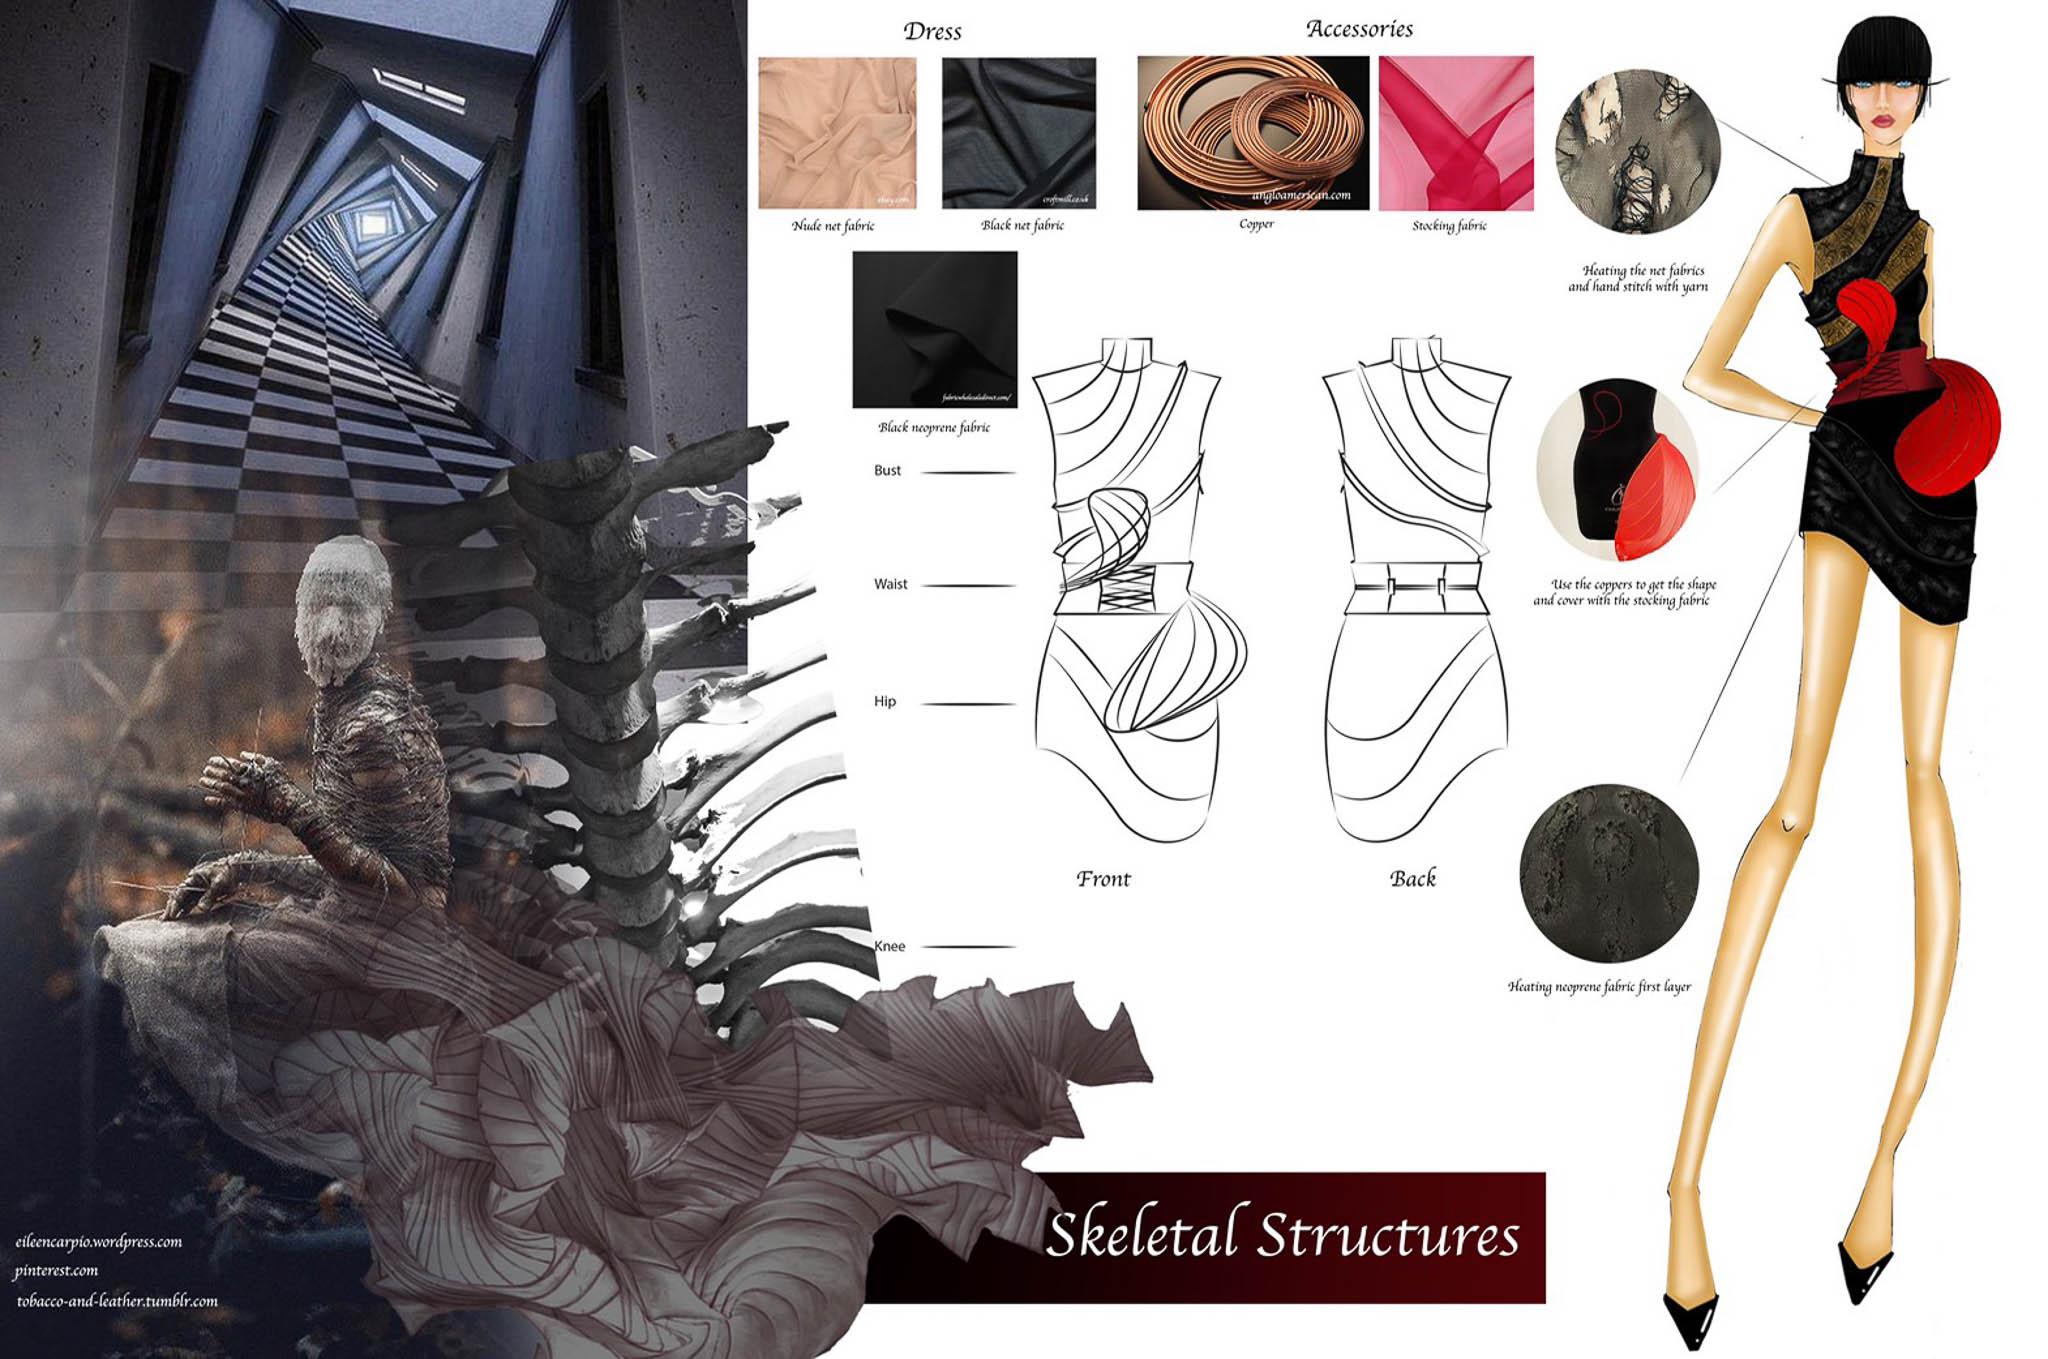 Skeletal Structures: Onwaree Sukjumroen, Thailand, Student, Raffles Design Institute Singapore